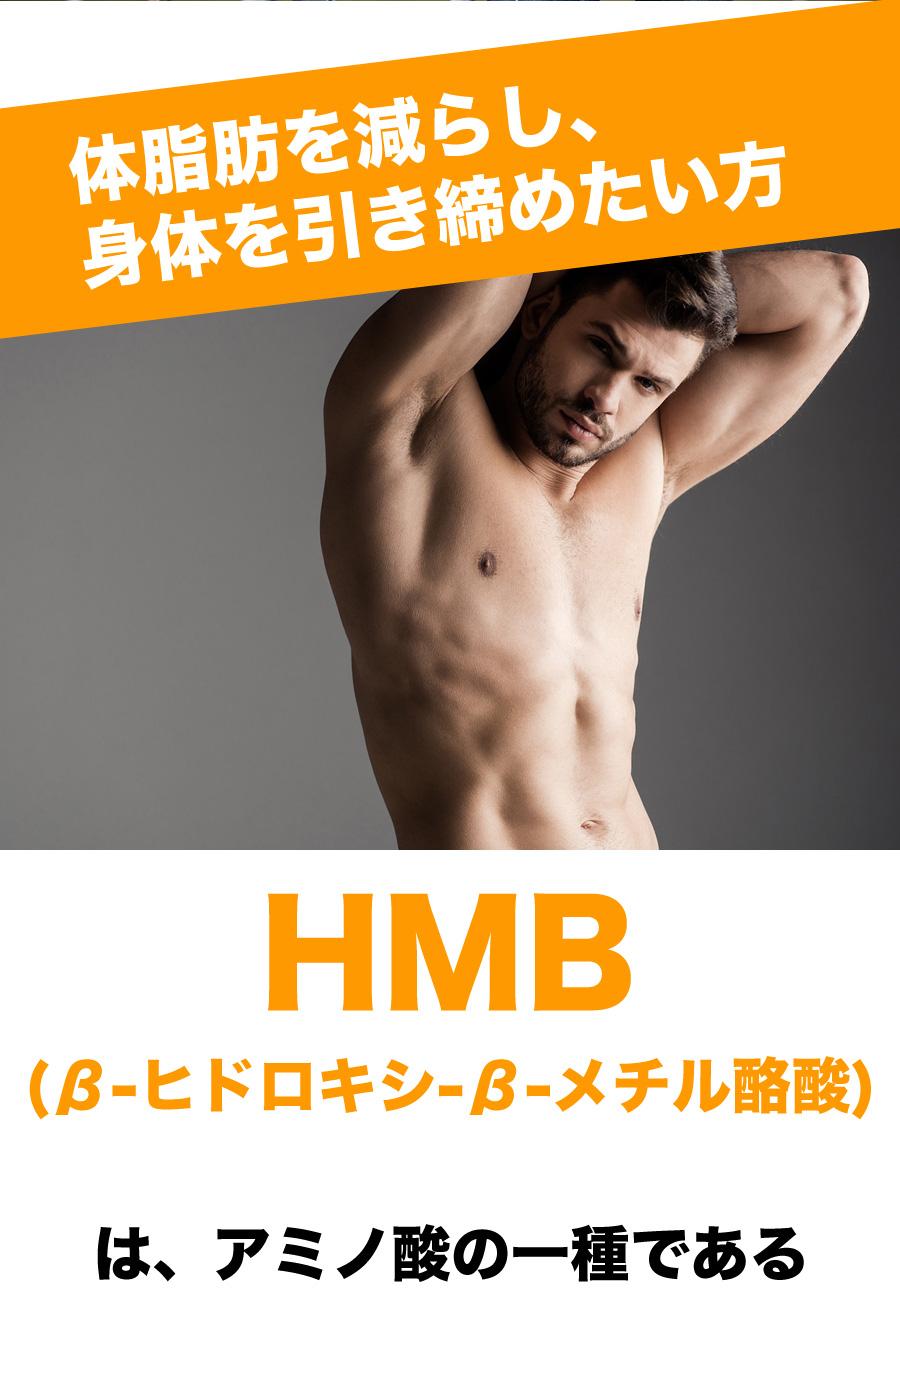 HMB説明6